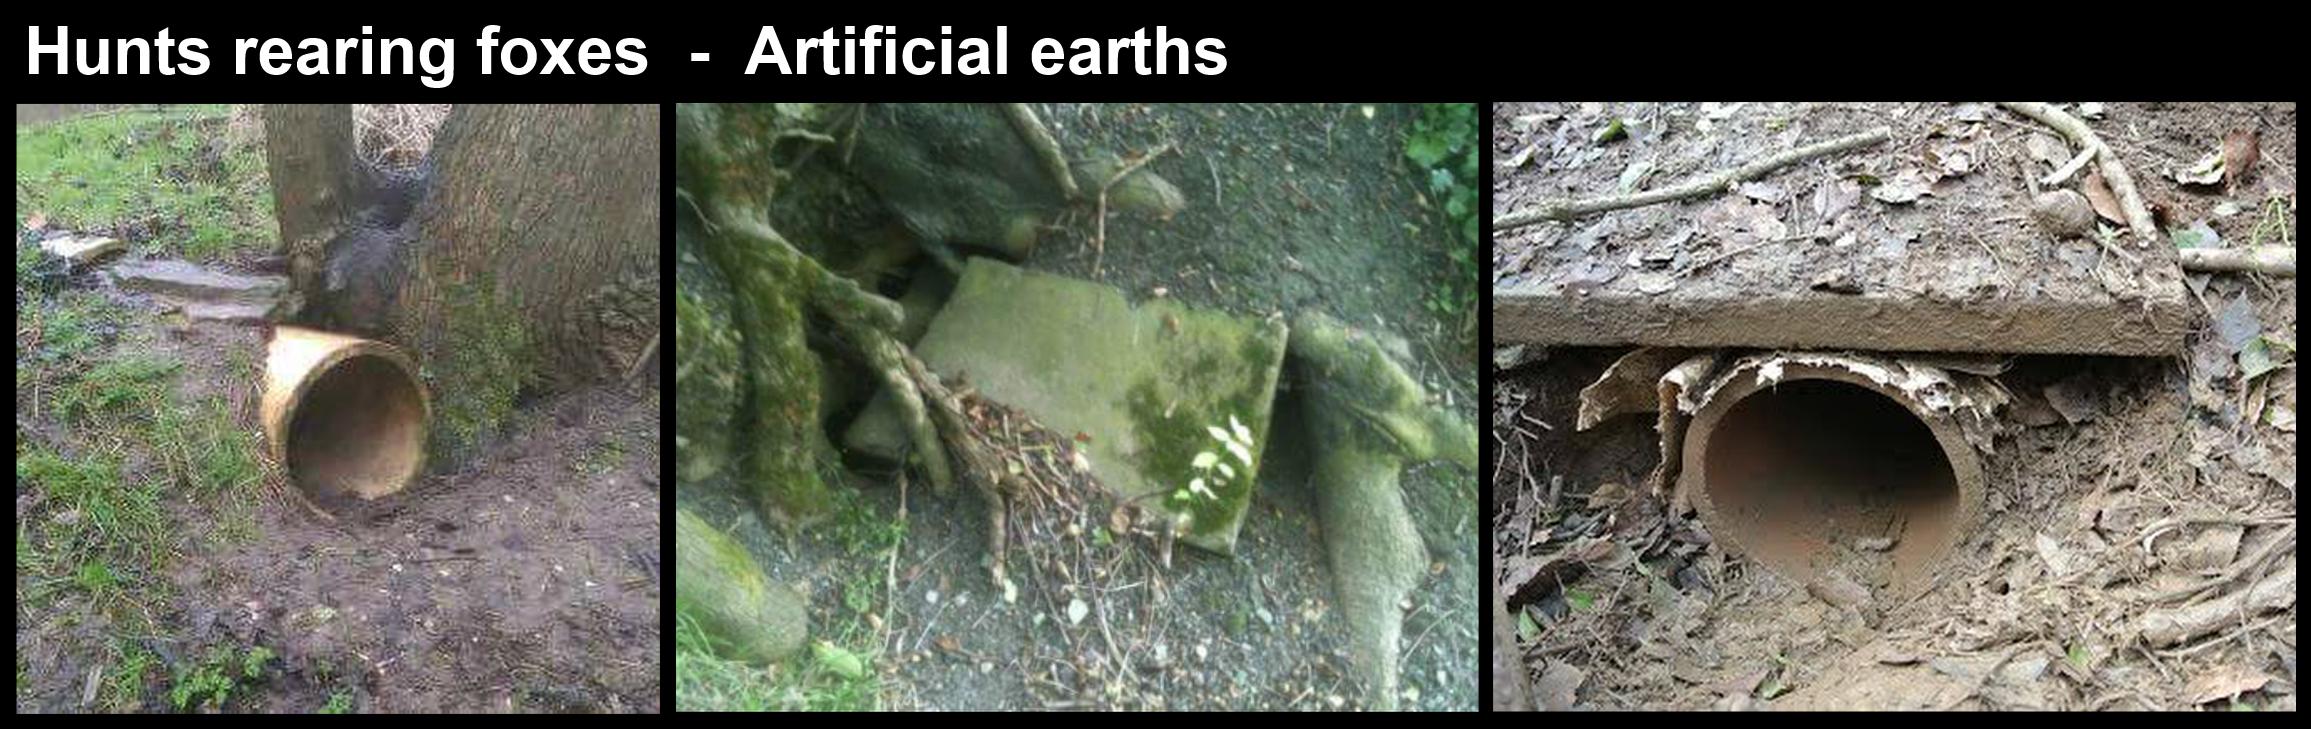 Artificial earths